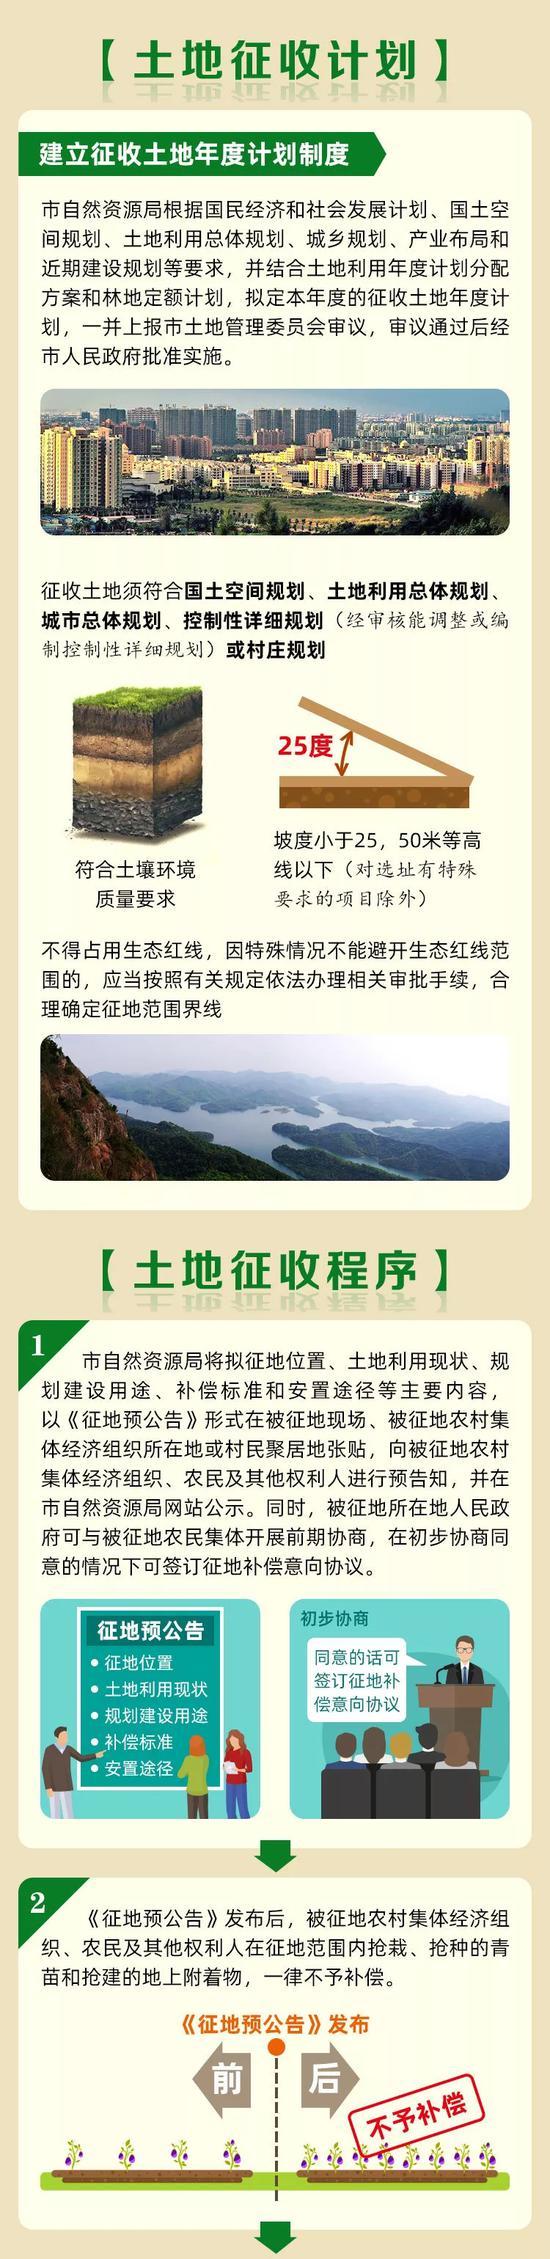 http://img.zhux2.com/editor1563702455899609.jpg